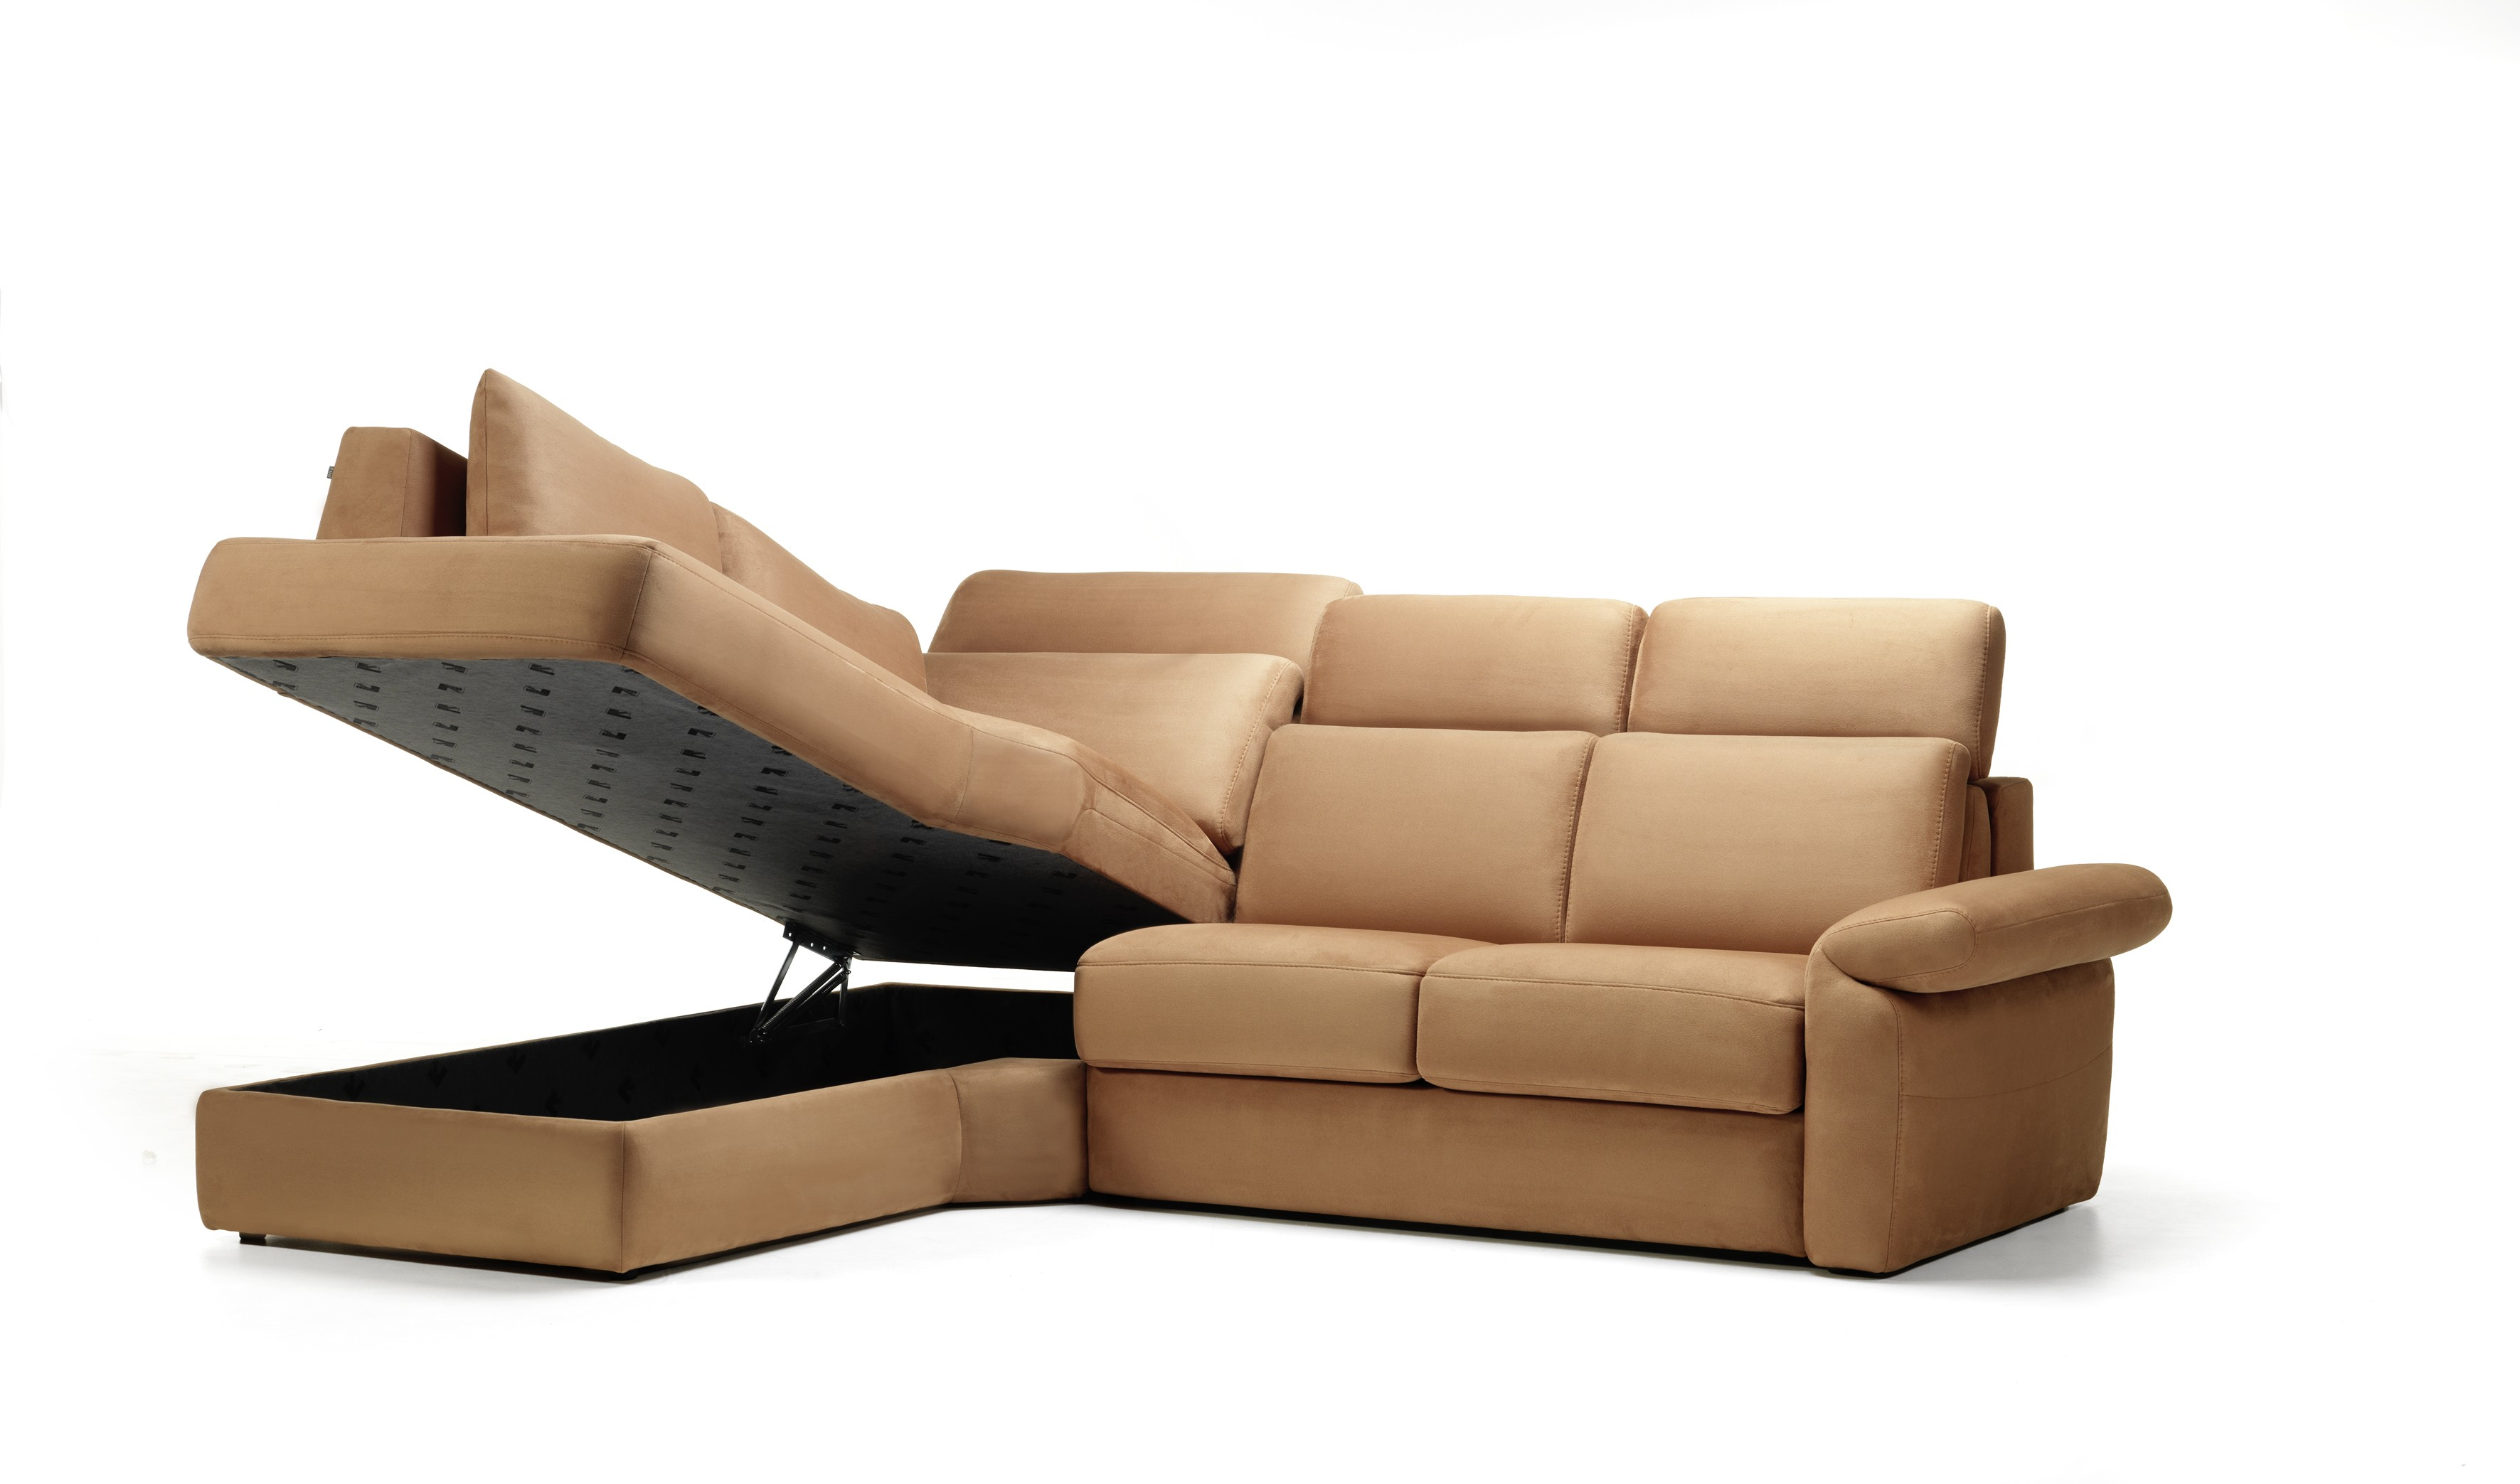 Atria Leather Sectional By Rom Belgium At Nova Interiors